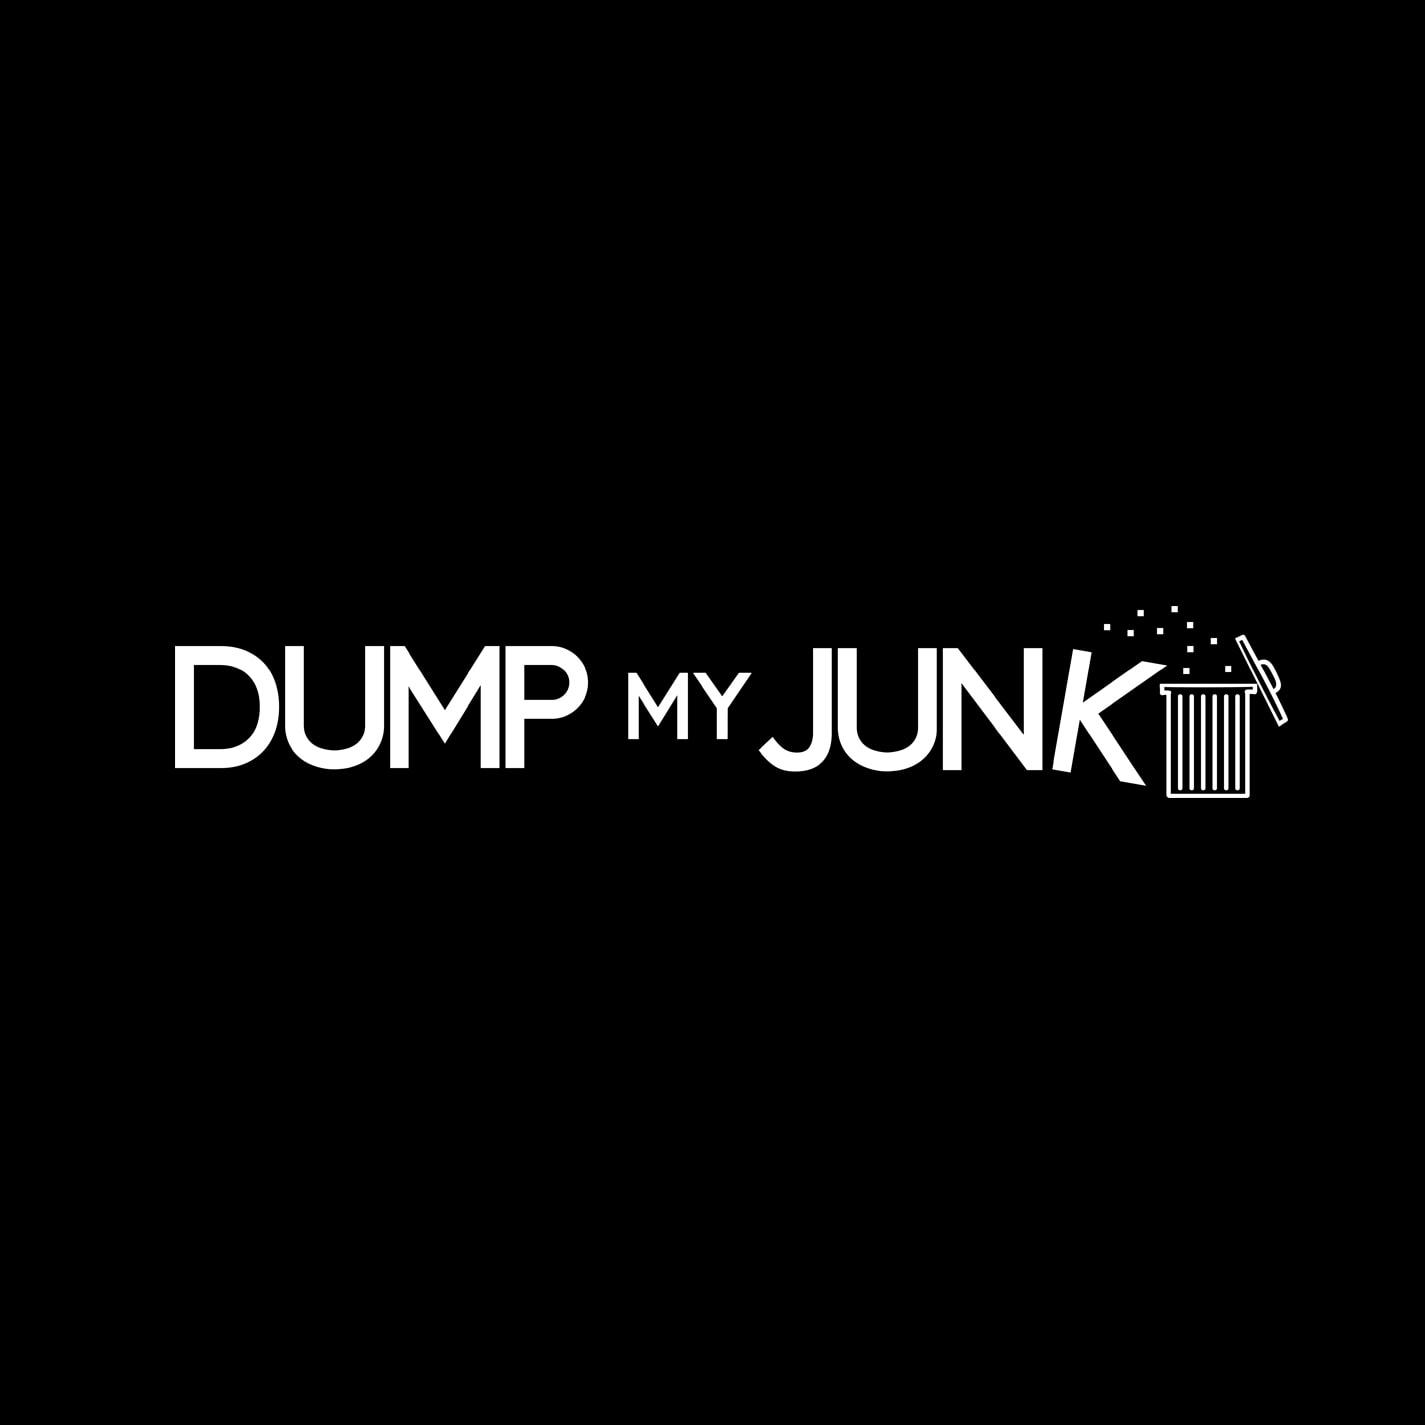 dumpmyjunk-logo-design-accolademedia